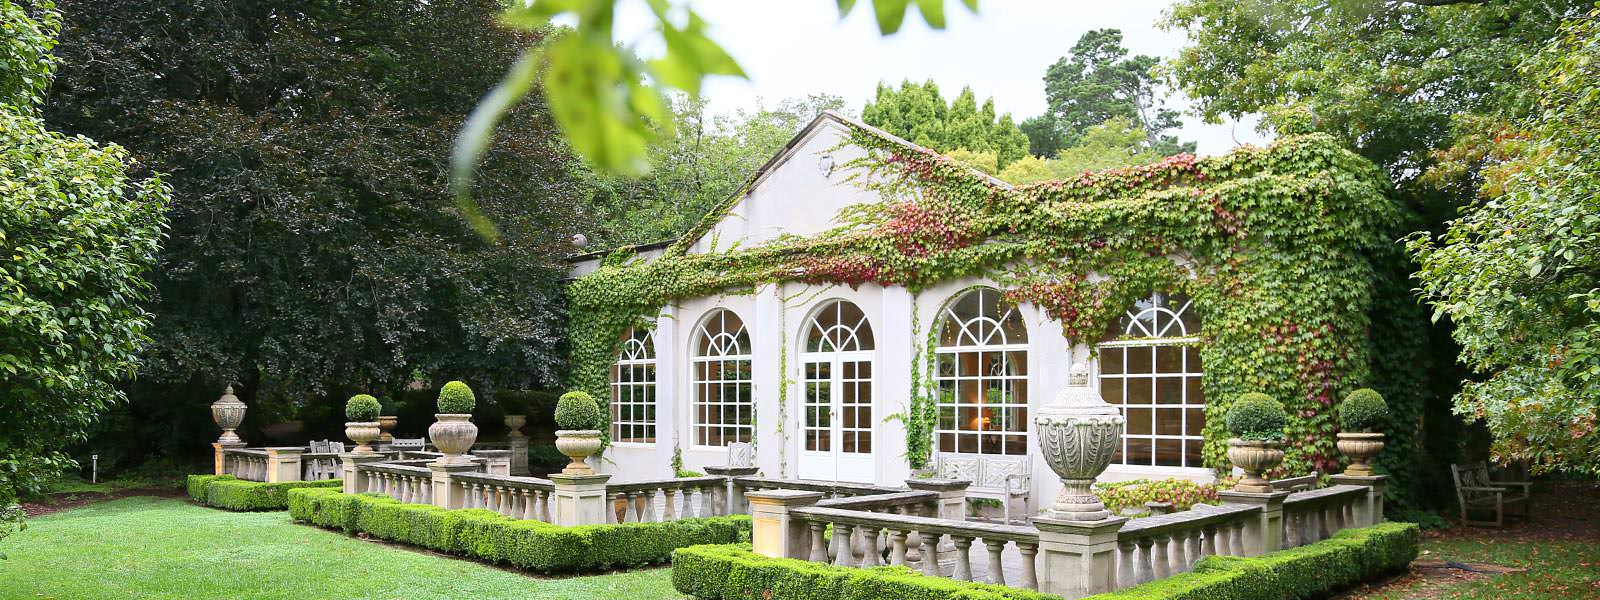 milton-park-gardens.jpg